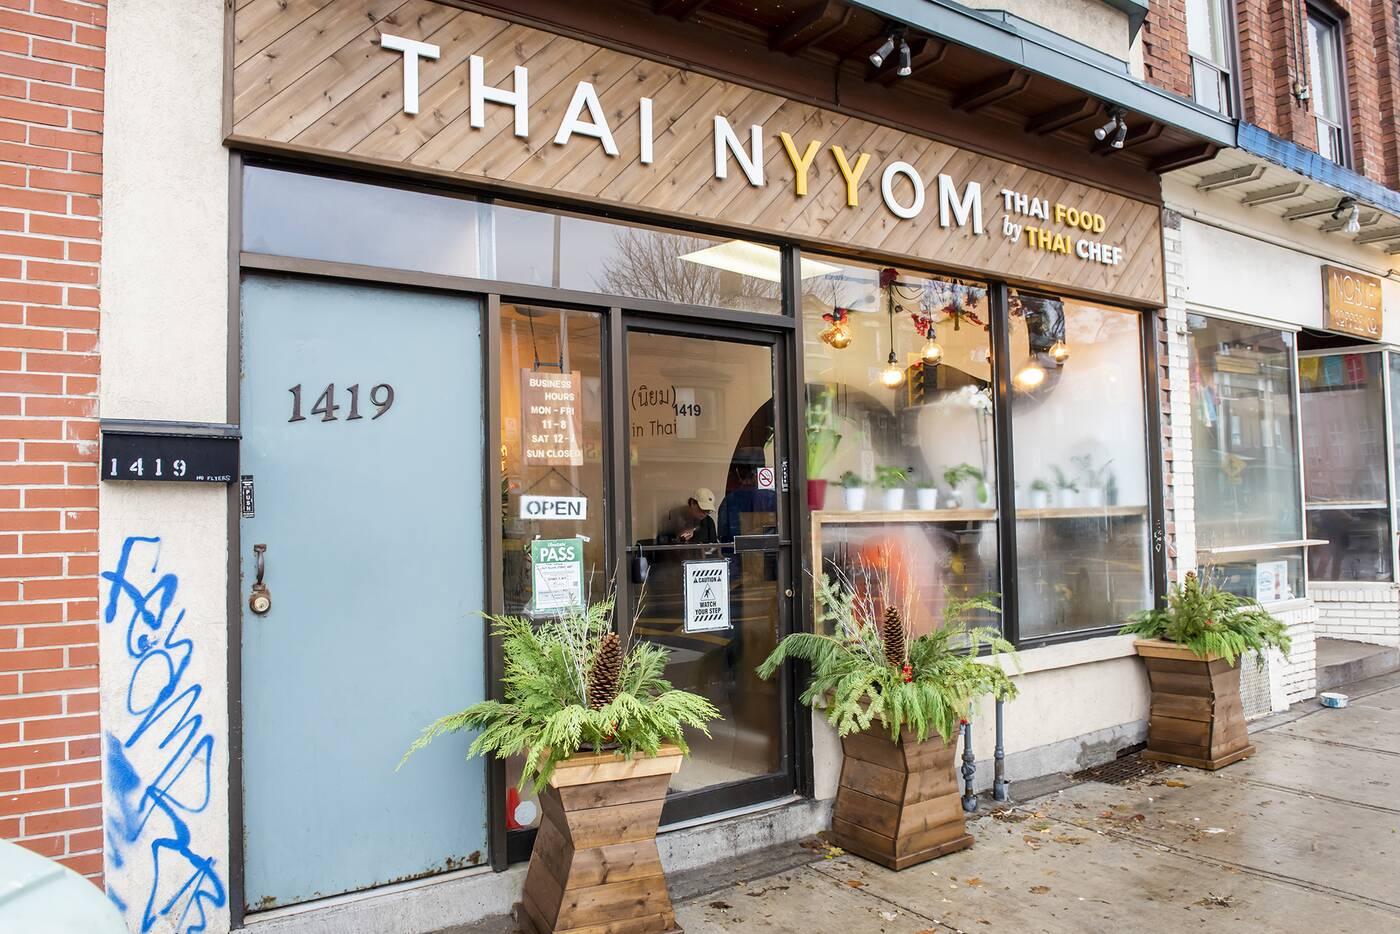 Thai Nyyom Toronto